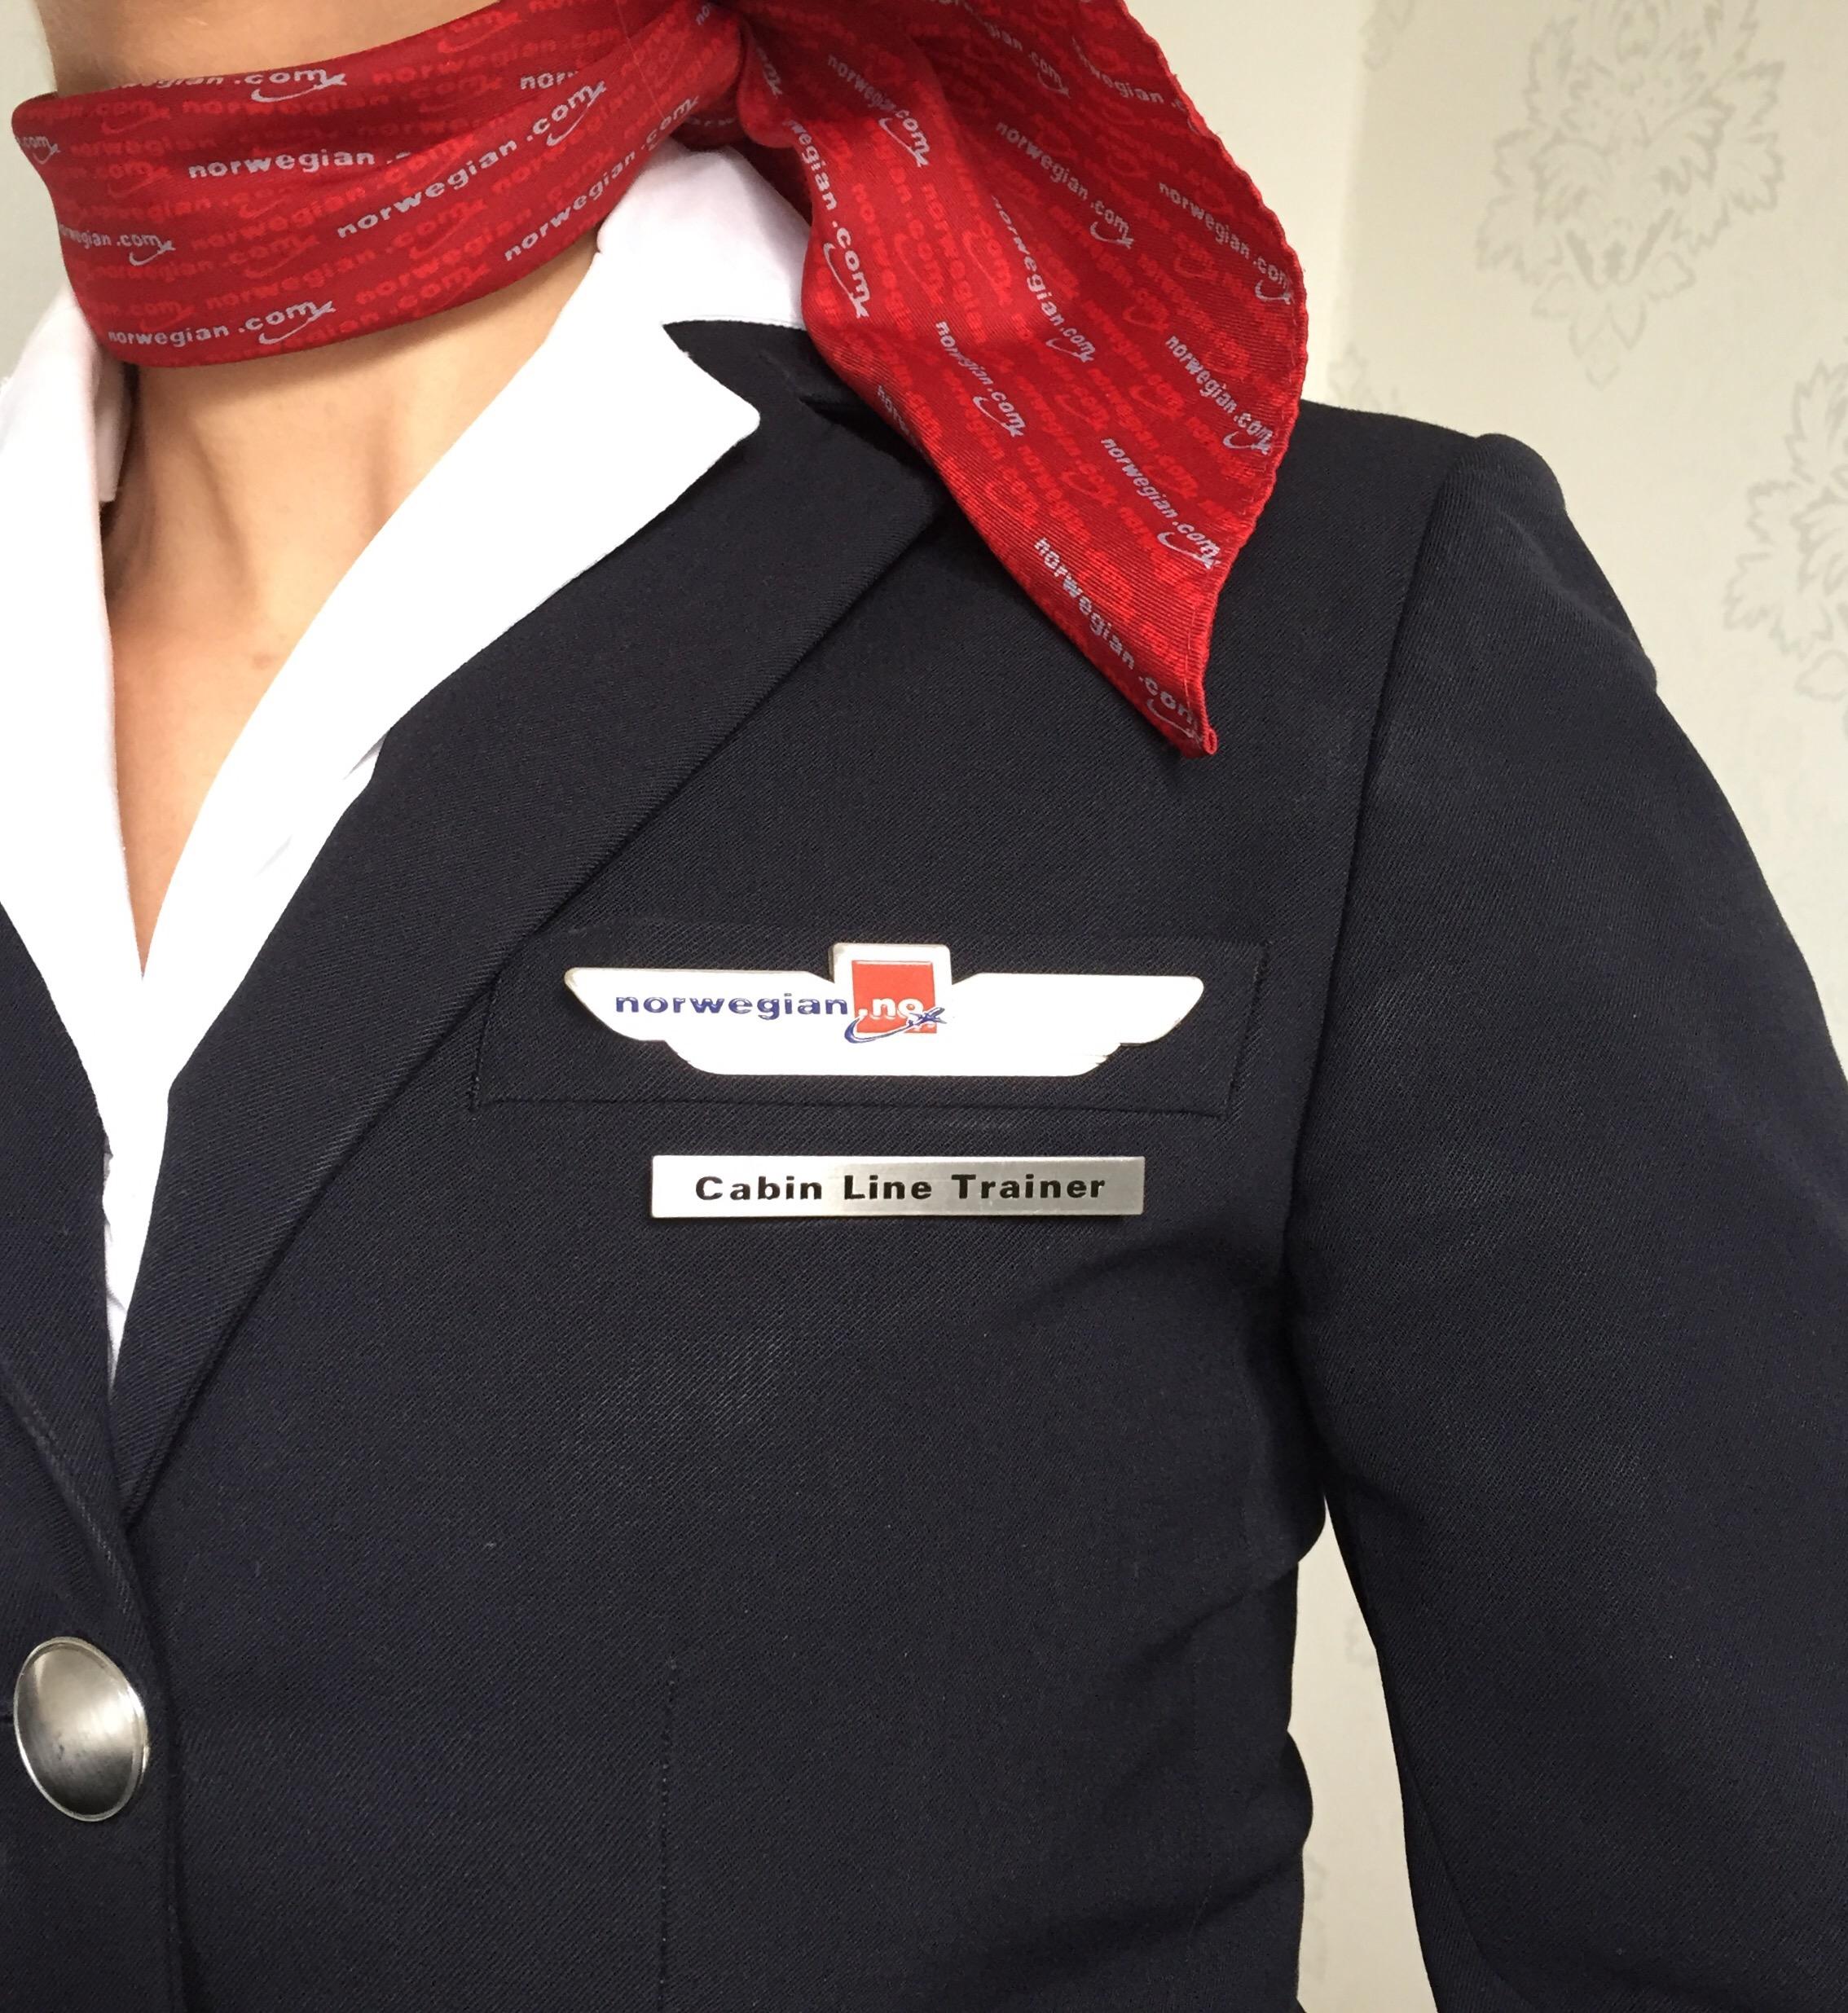 cabin line trainer